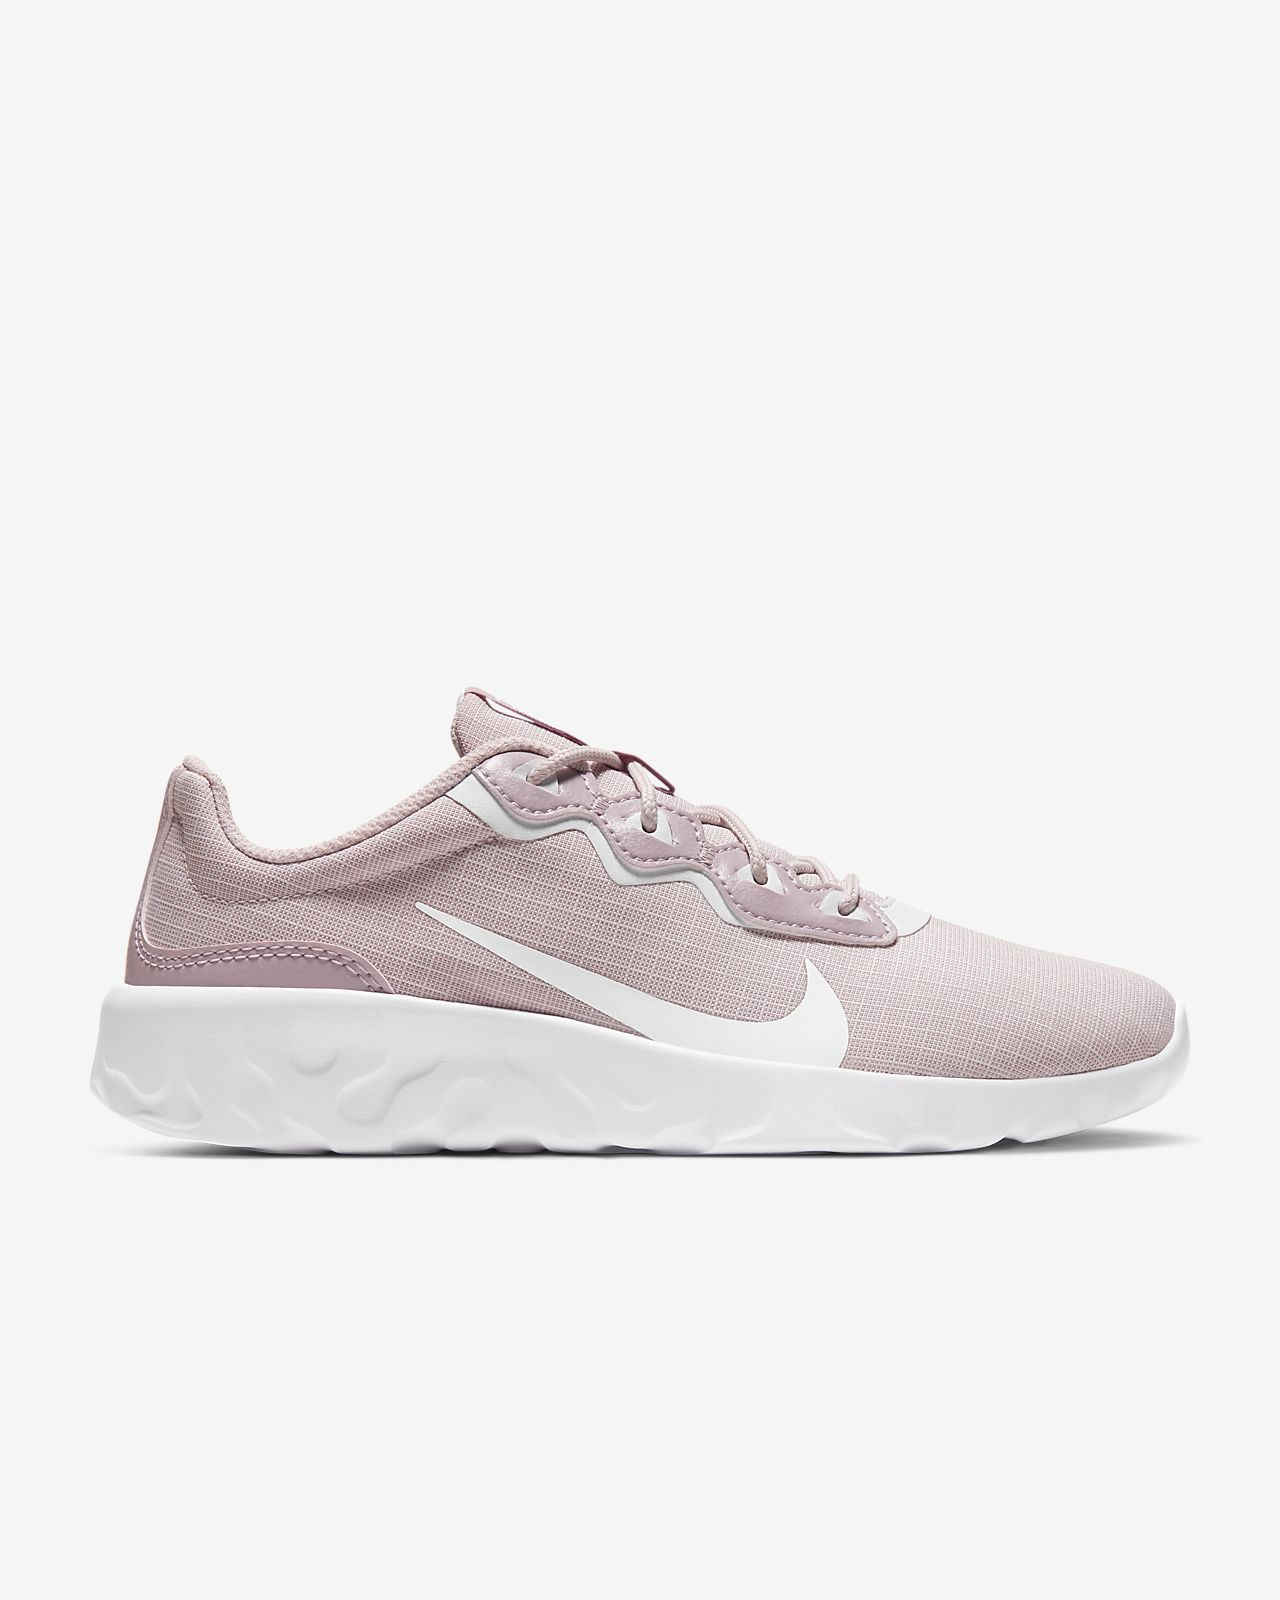 Nike Explore Strada Damenschuh